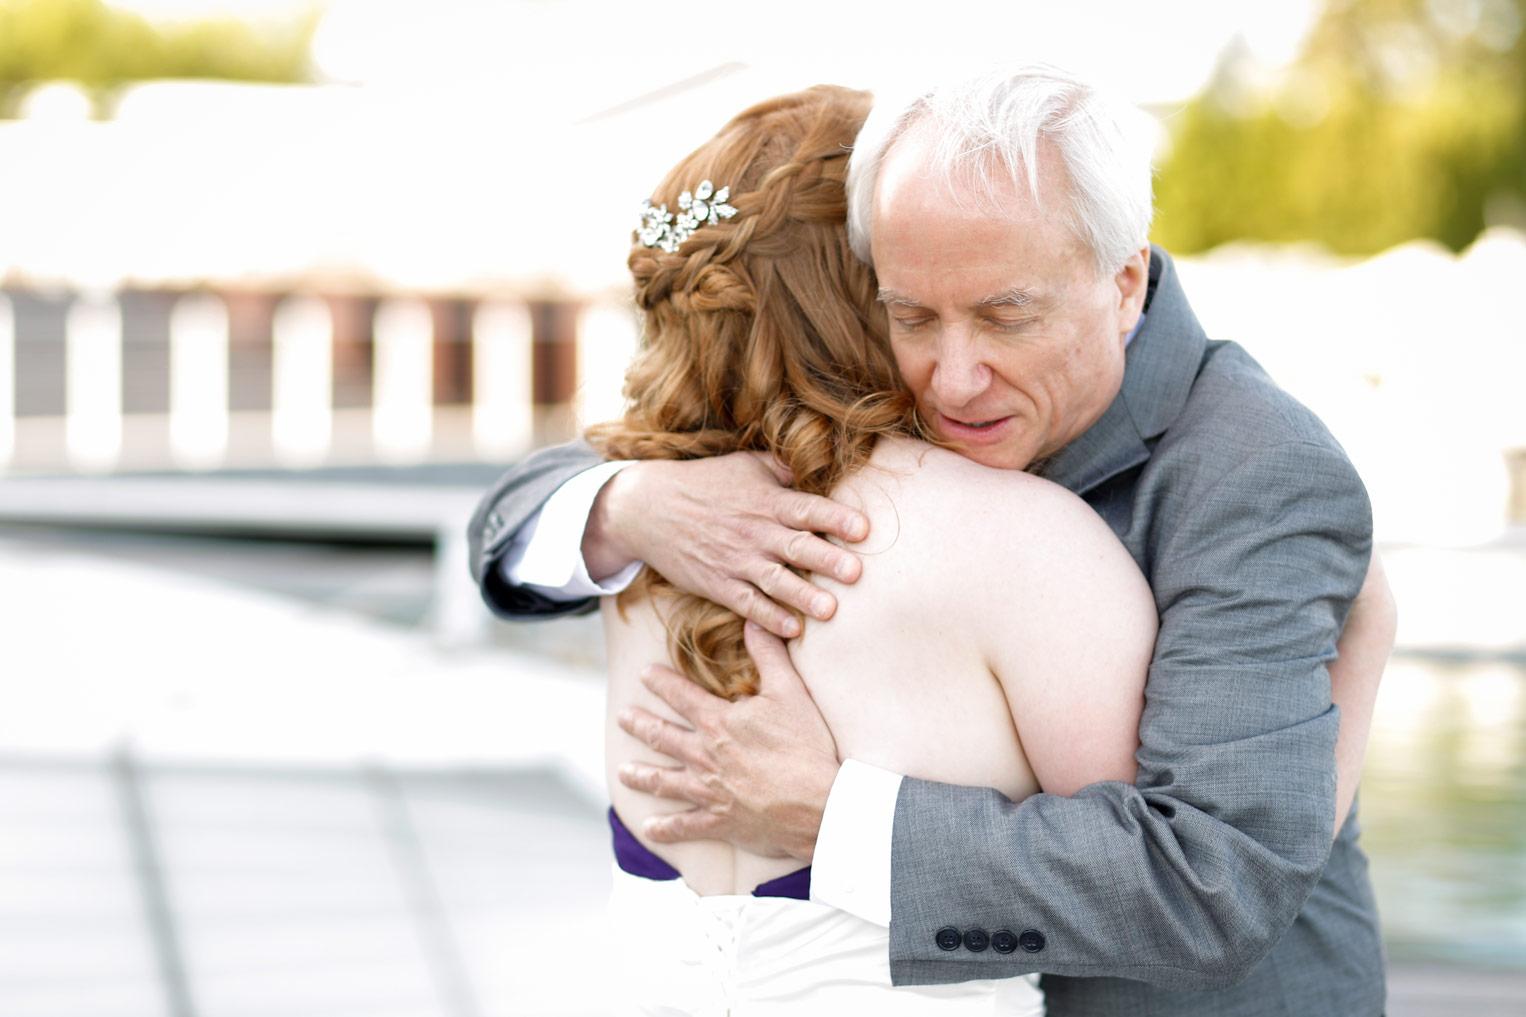 milwaukee-discovery-world-pier-wisconsin-wedding-ruthie-hauge-photography-10.jpg